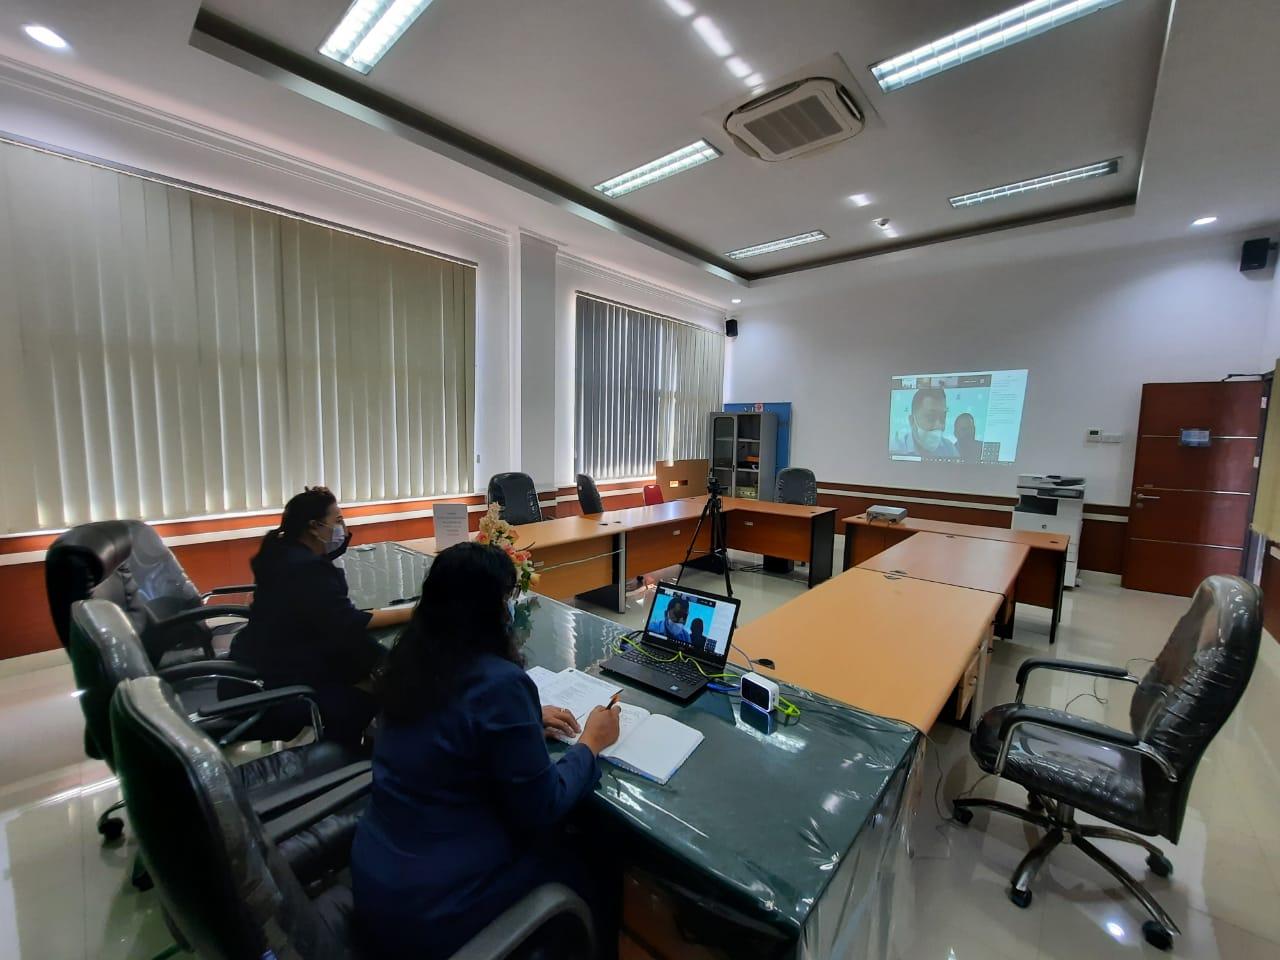 Pelaksanaan Evaluasi Pelaksanaan Anggaran Bulan Juli 2021 Bersama Satuan Kerja Lingkup Kantor Wilayah Direktorat Jenderal Perbendaharaan Provinsi Sulawesi Utara